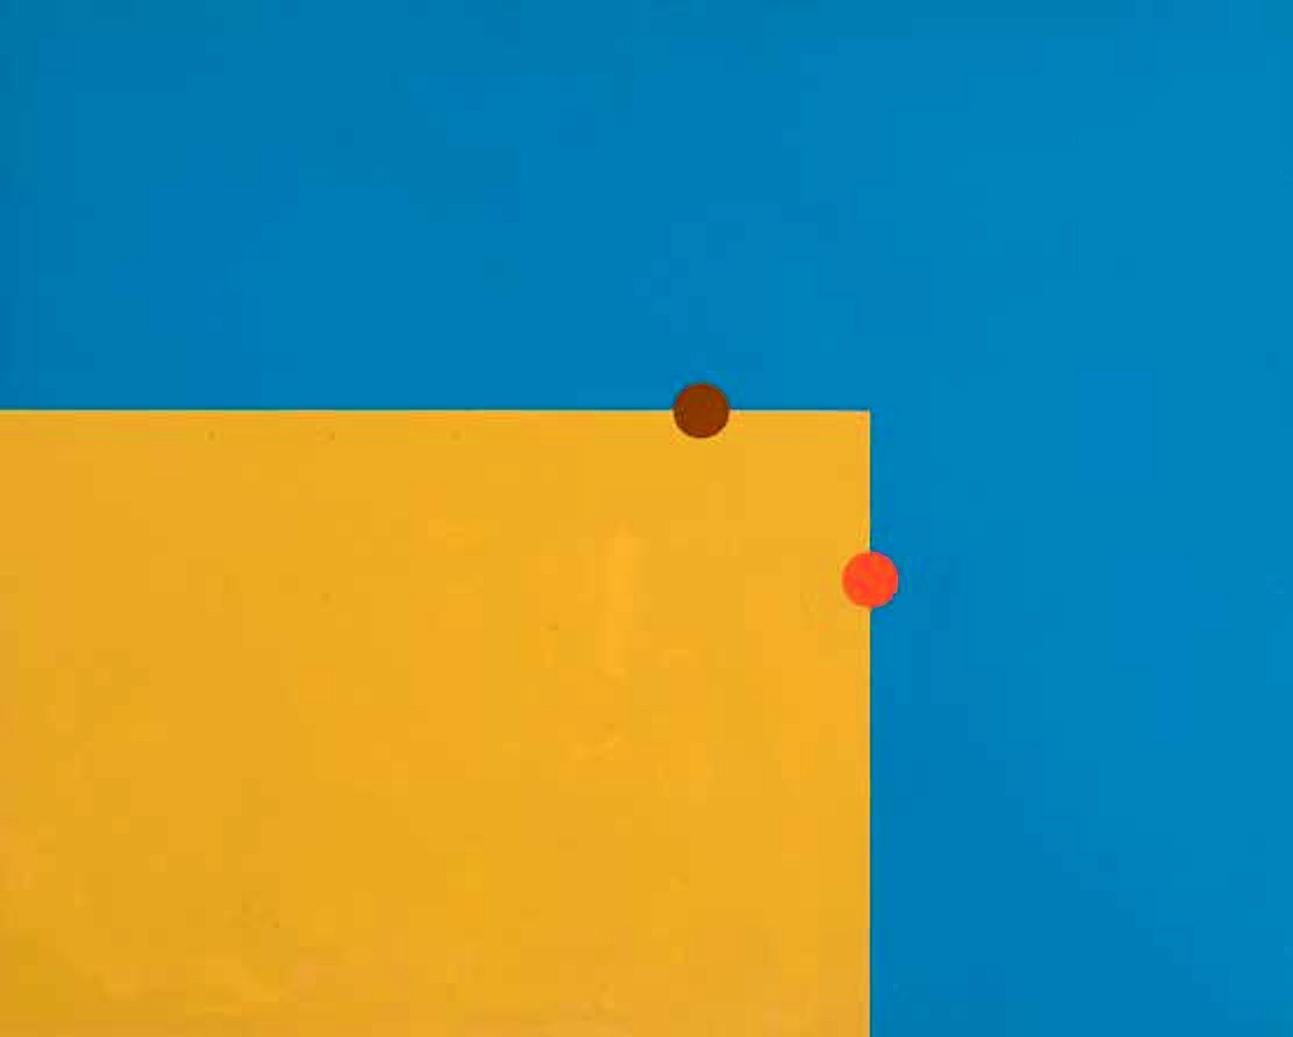 Емануель Проуллер. Два кола на куті, 1960; картон, гуаш